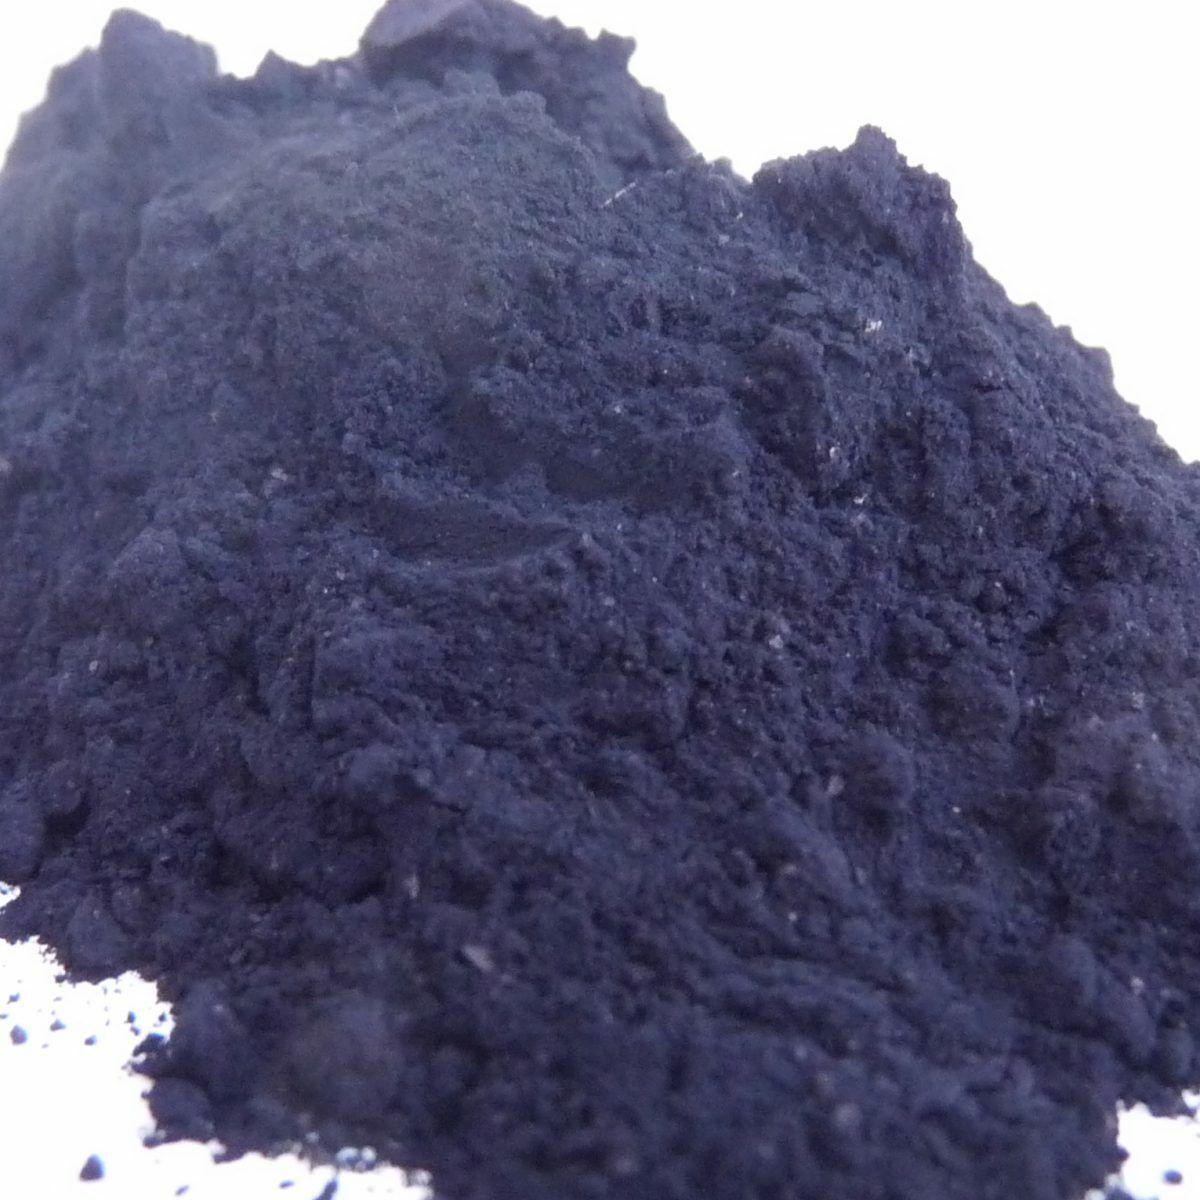 Carmin d'Indigo Indigotine E132 poudre Couleurant alimentaire hydrosoluble - 1kg